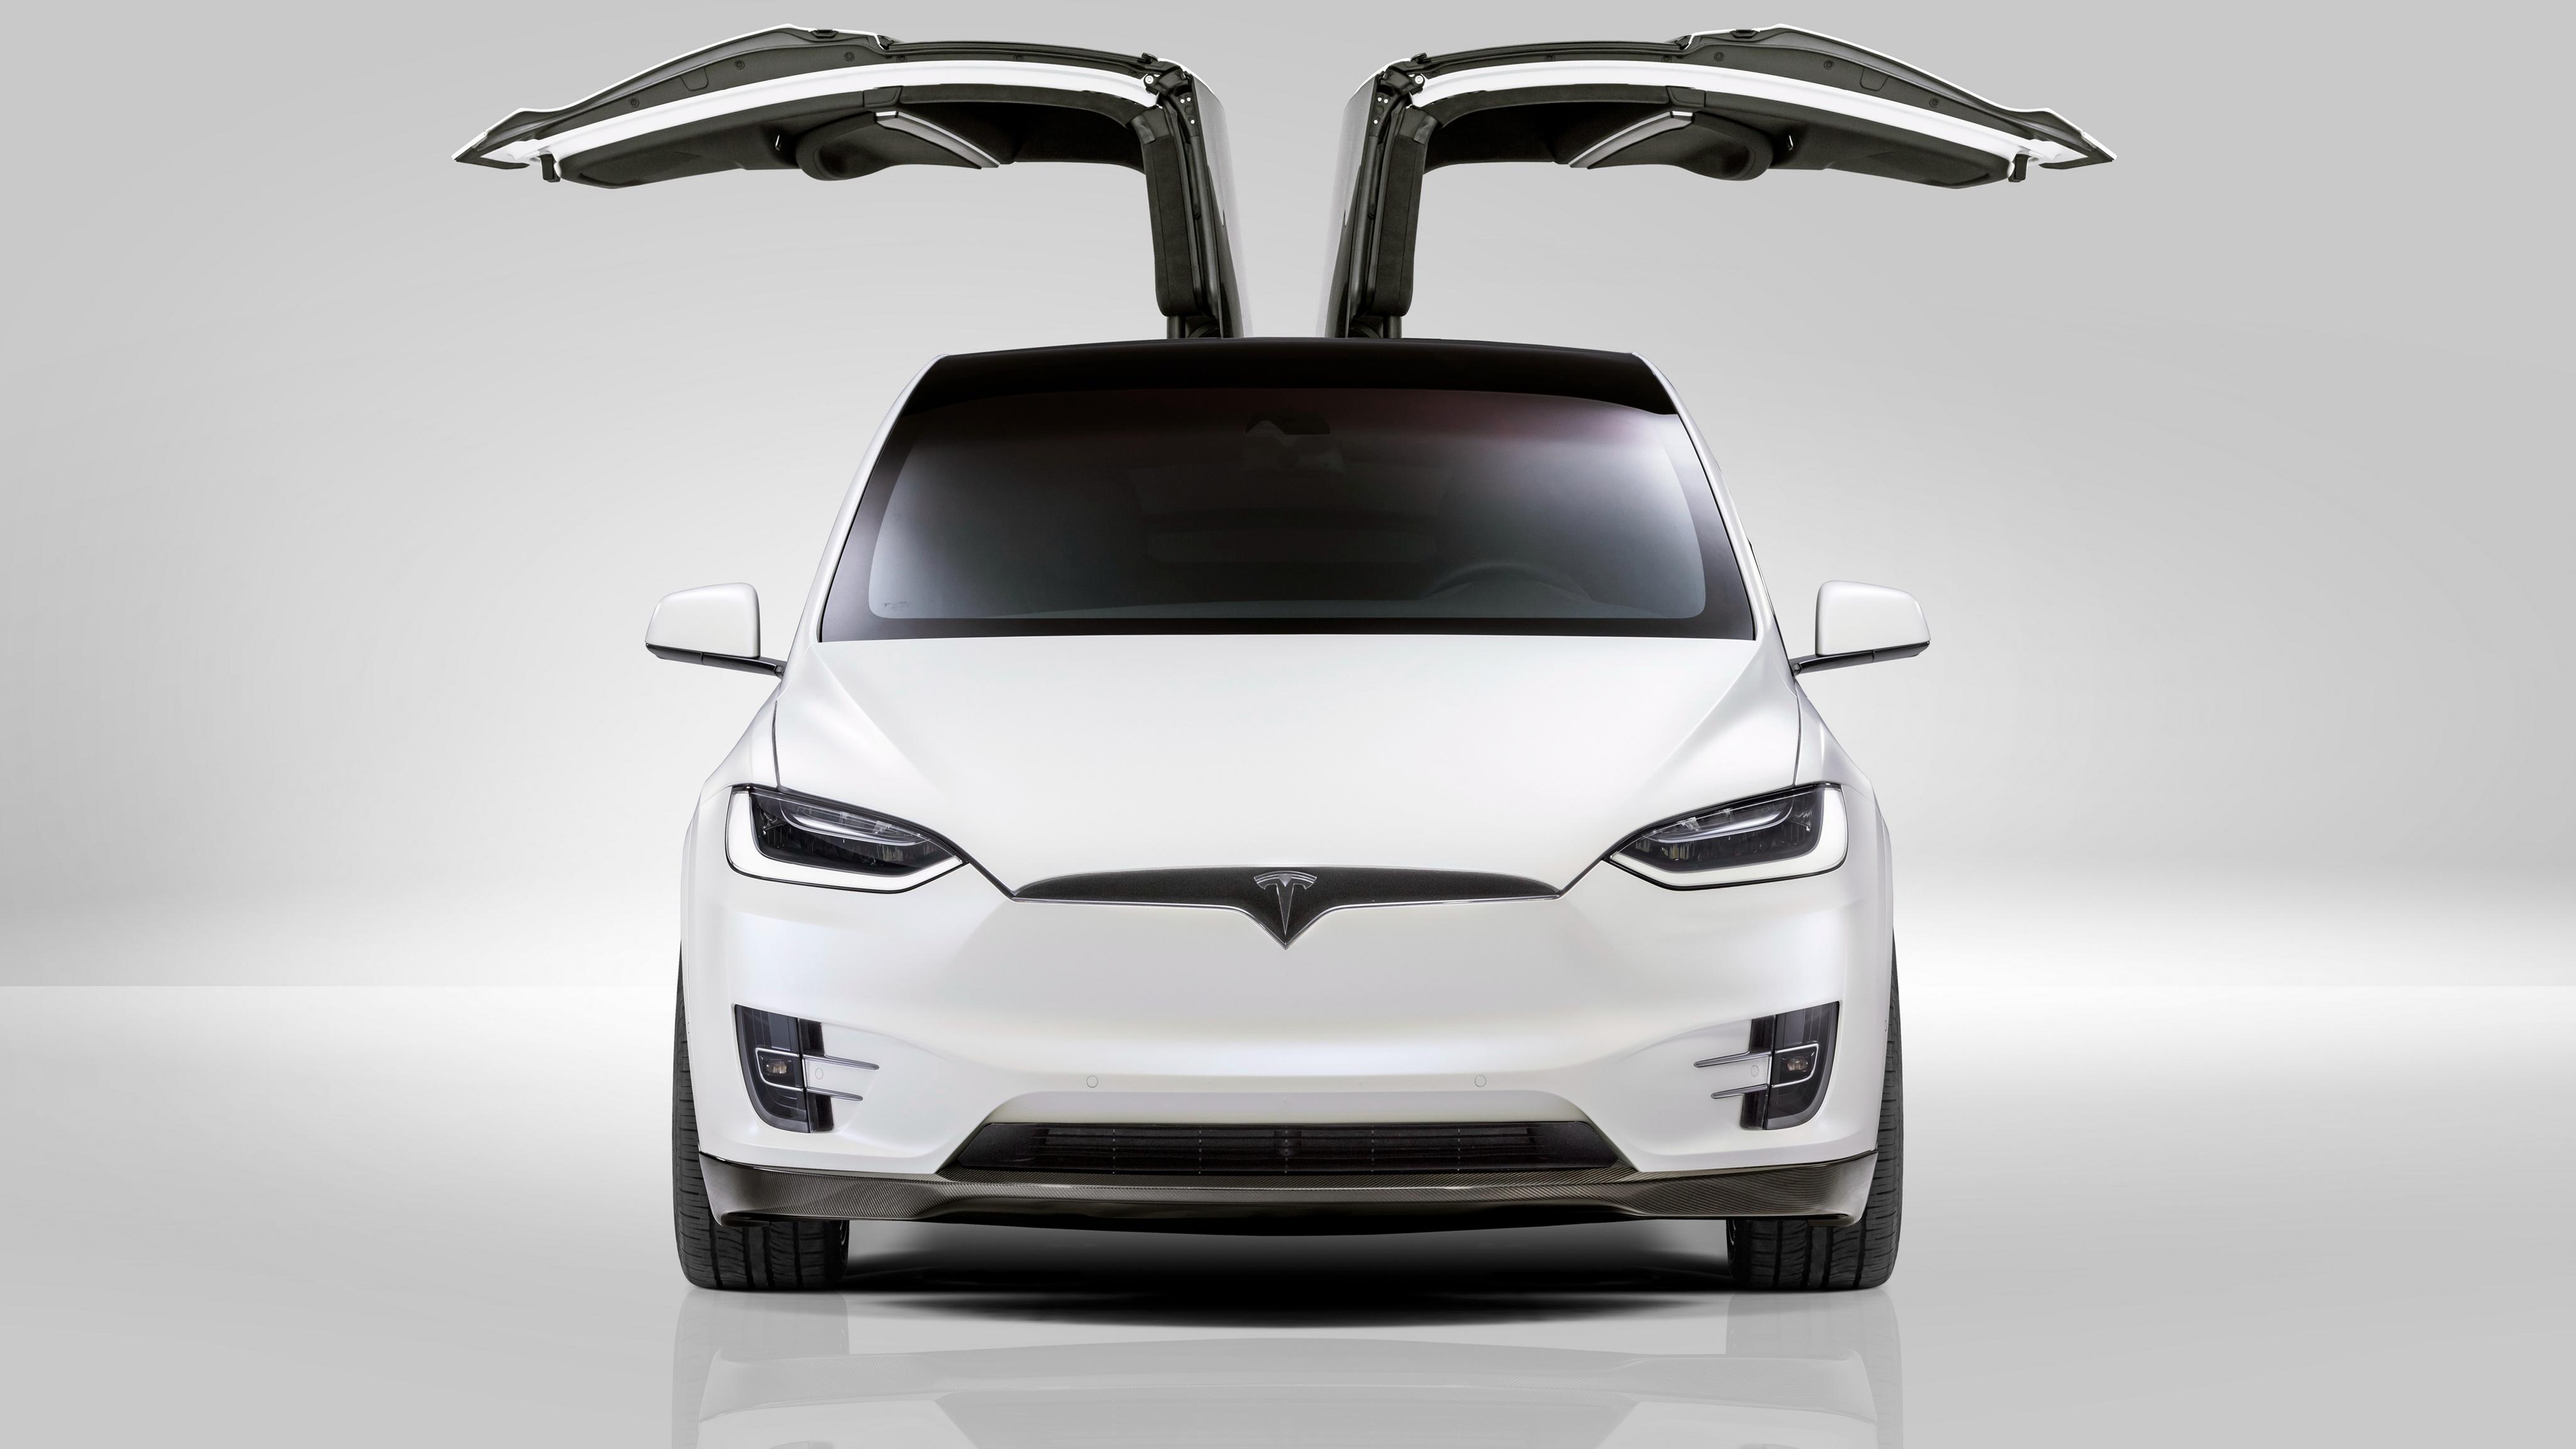 2018 Novitec Tesla Model X 4k Wallpaper Hd Car